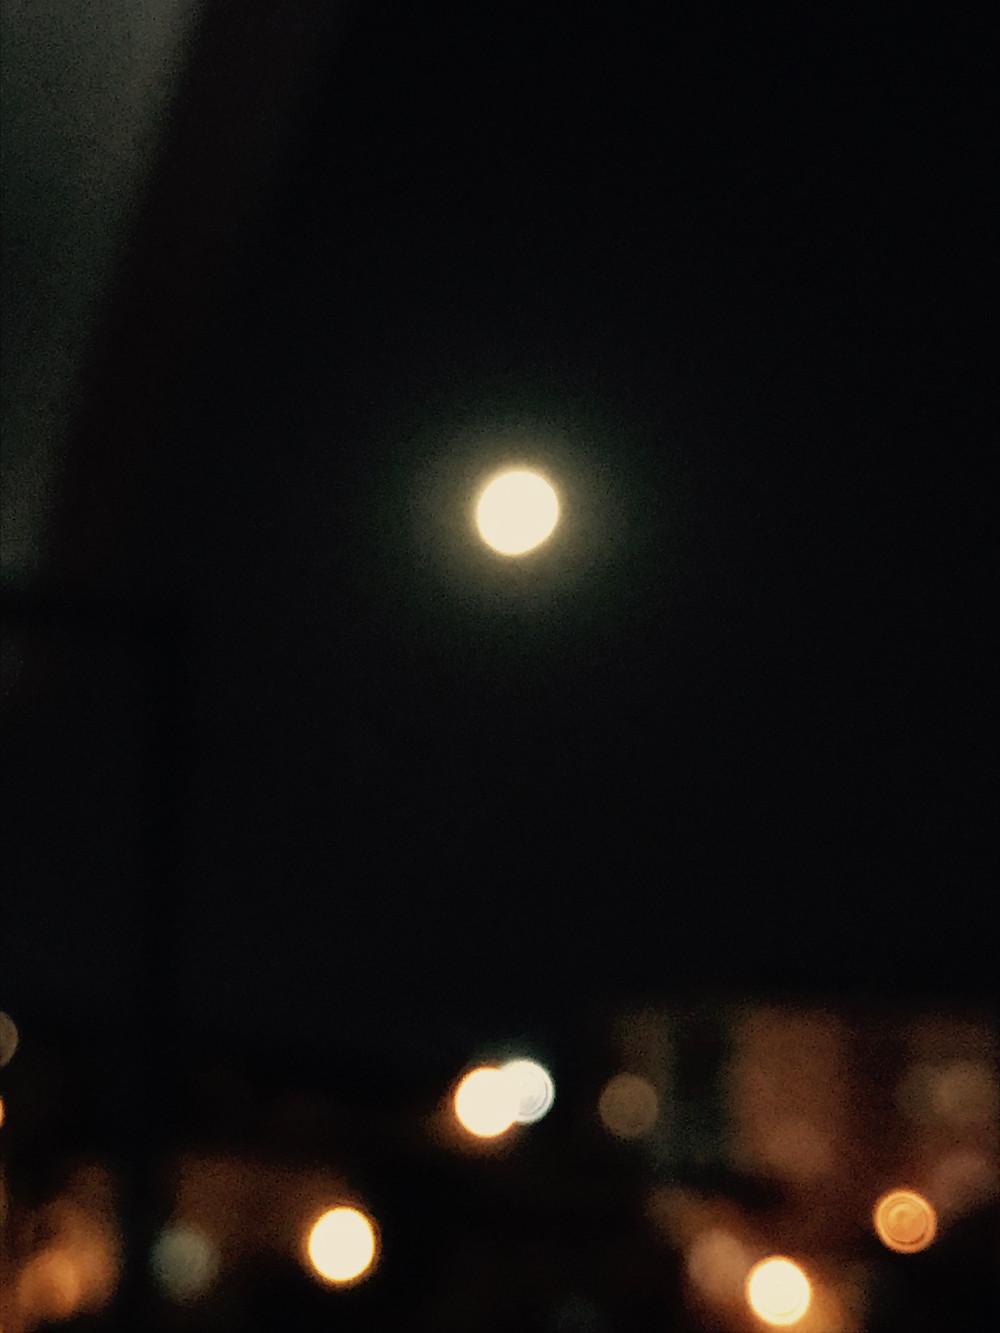 Full Moon over The Studio in Çanakkale